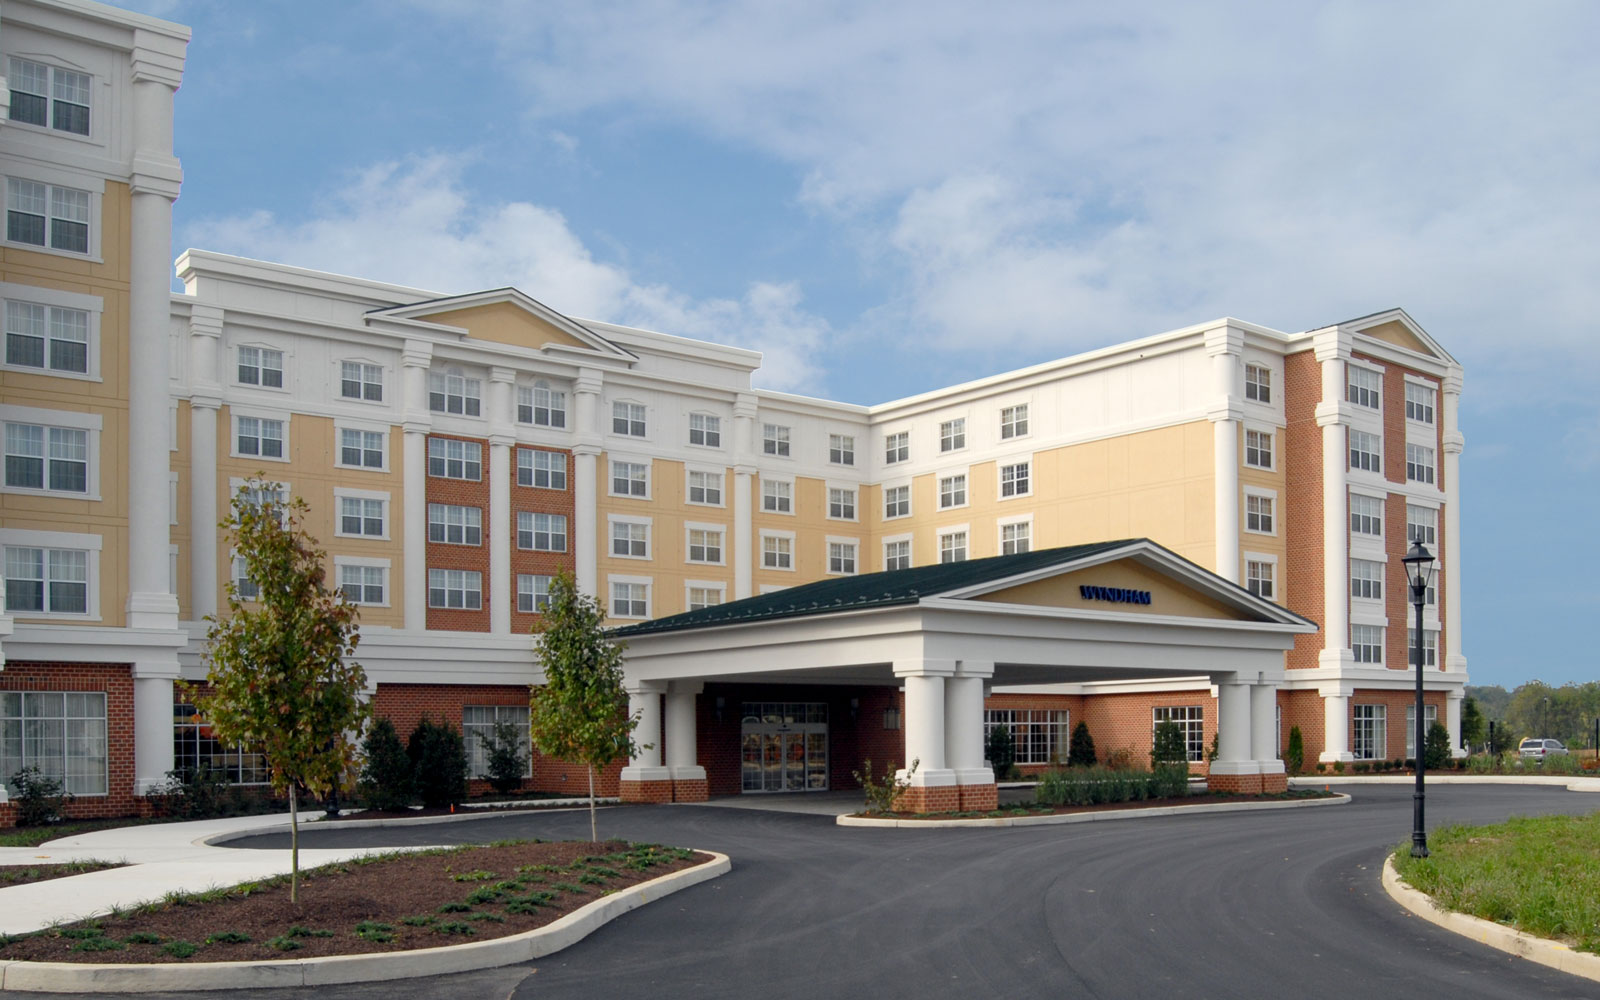 Gettysburg Pa Hotels Courtyard Marriott Wyndham